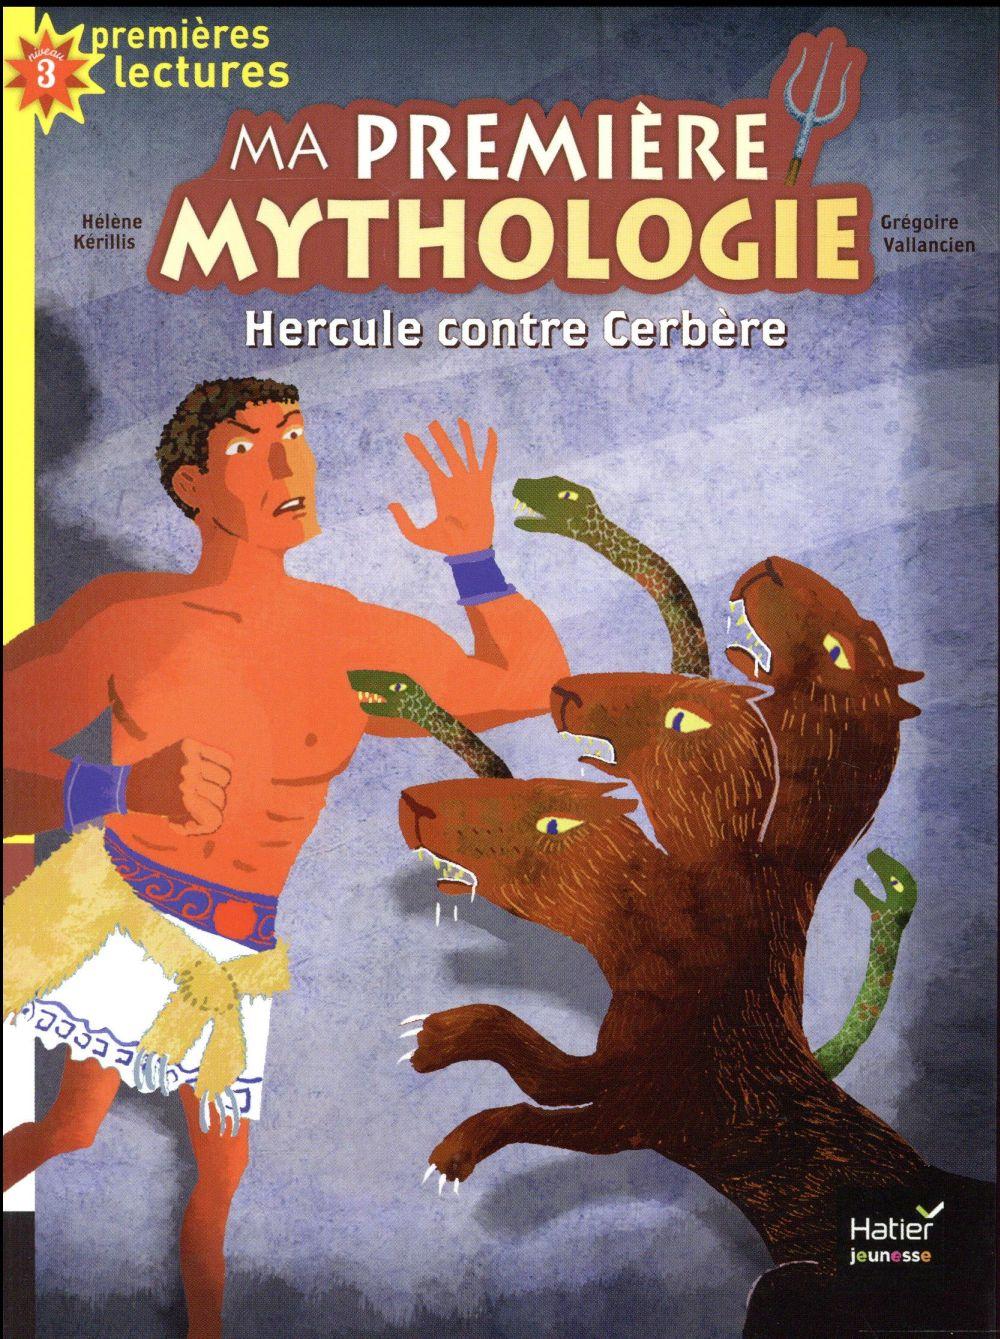 MA PREMIERE MYTHOLOGIE - T08 - MA PREMIERE MYTHOLOGIE - HERCULE CONTRE CERBERE CP/CE1 6/7 ANS